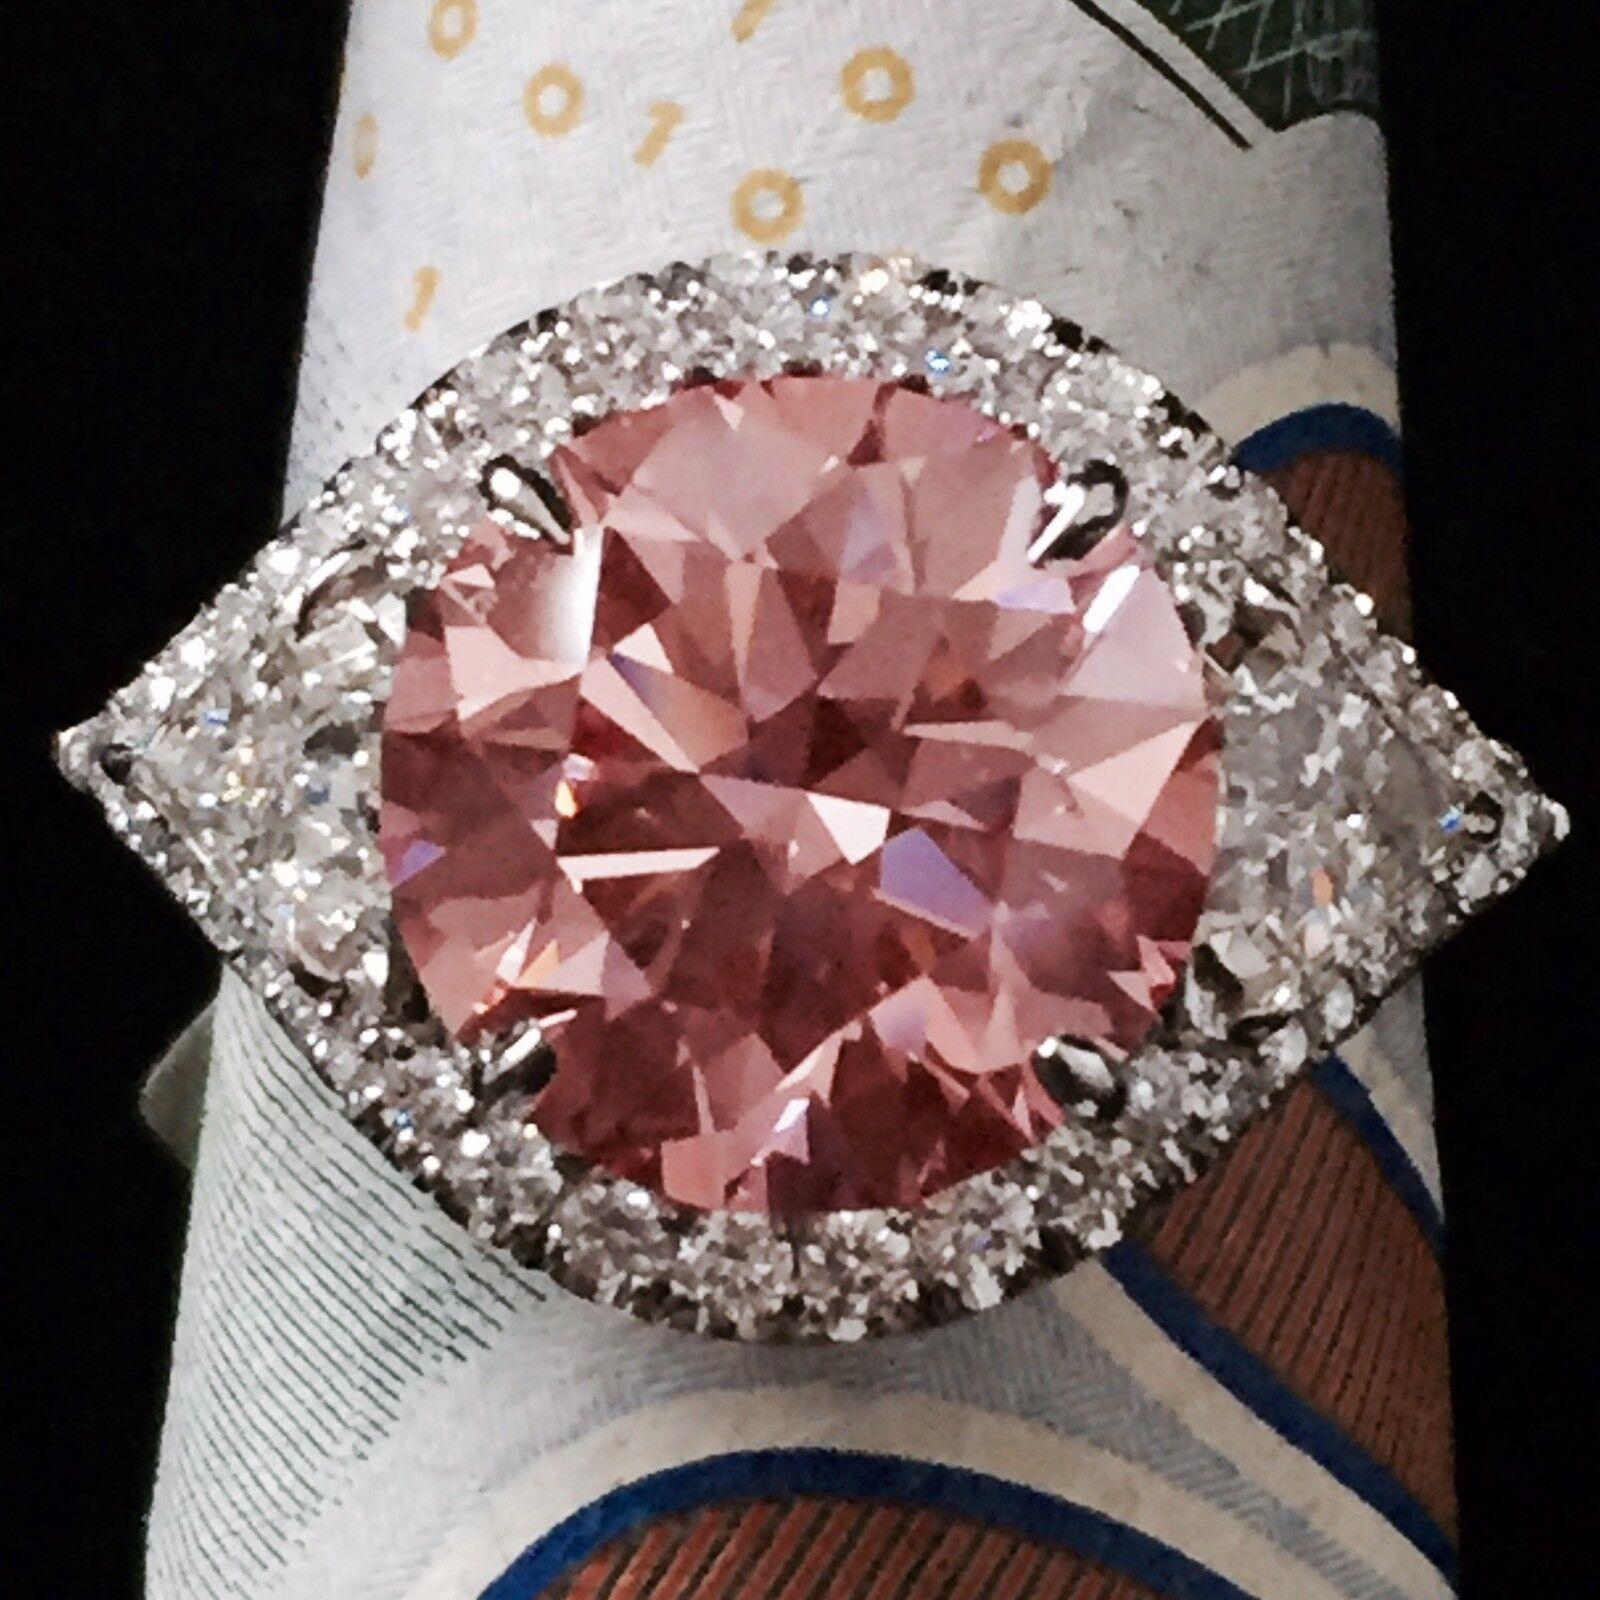 7.05 CARAT VS GIA FANCY PINK ROUND CUT DIAMOND HALO ENGAGEMENT RING 950 PLATINUM